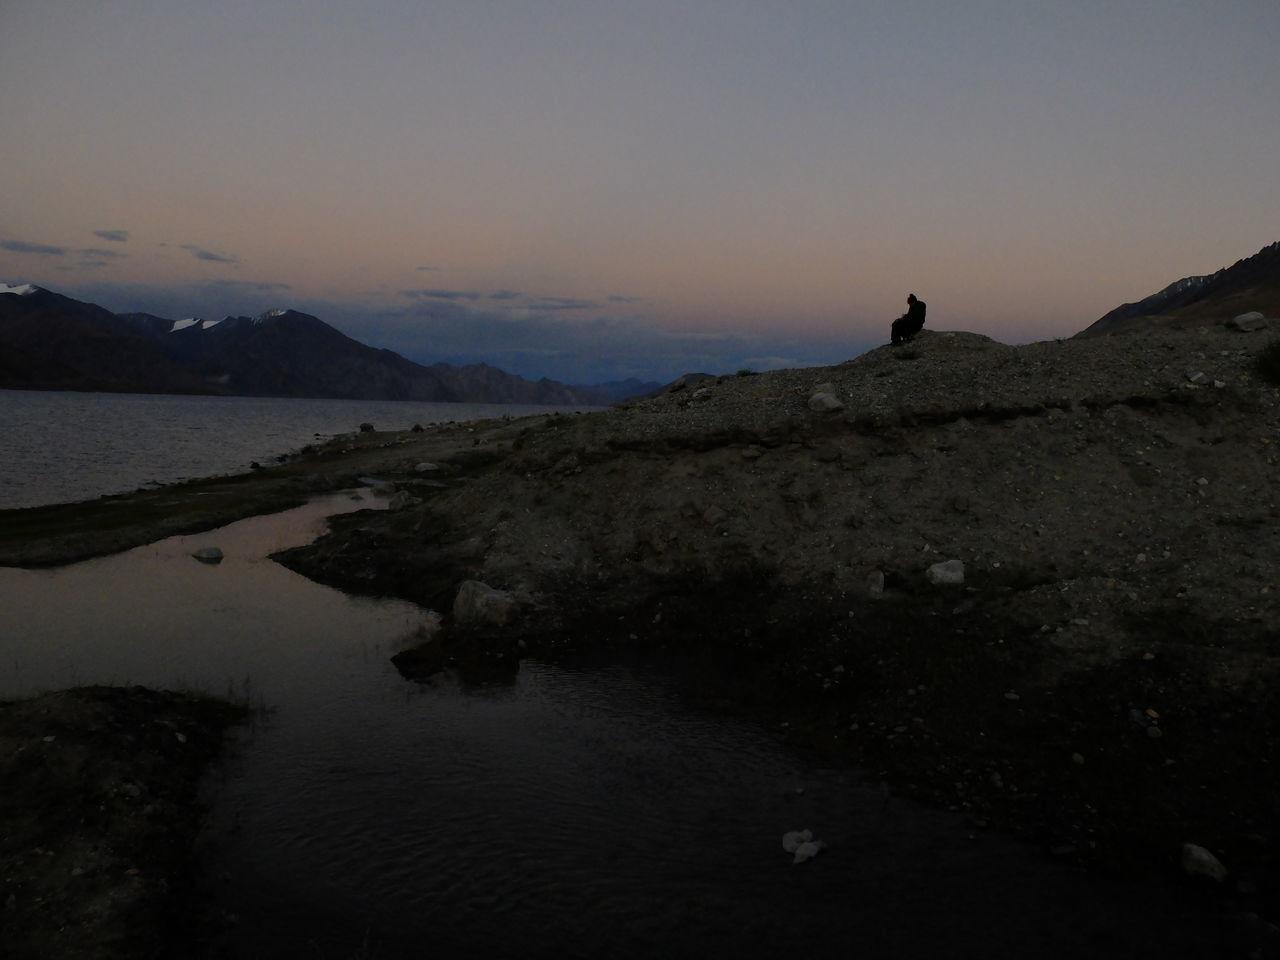 Beauty In Nature Day Jammu And Kashmir Landscape Leh Ladakh Mountain Nature No People Outdoors Pangong Lake Pangong Tso Scenics Sky Sunset Tranquil Scene Tranquility Water